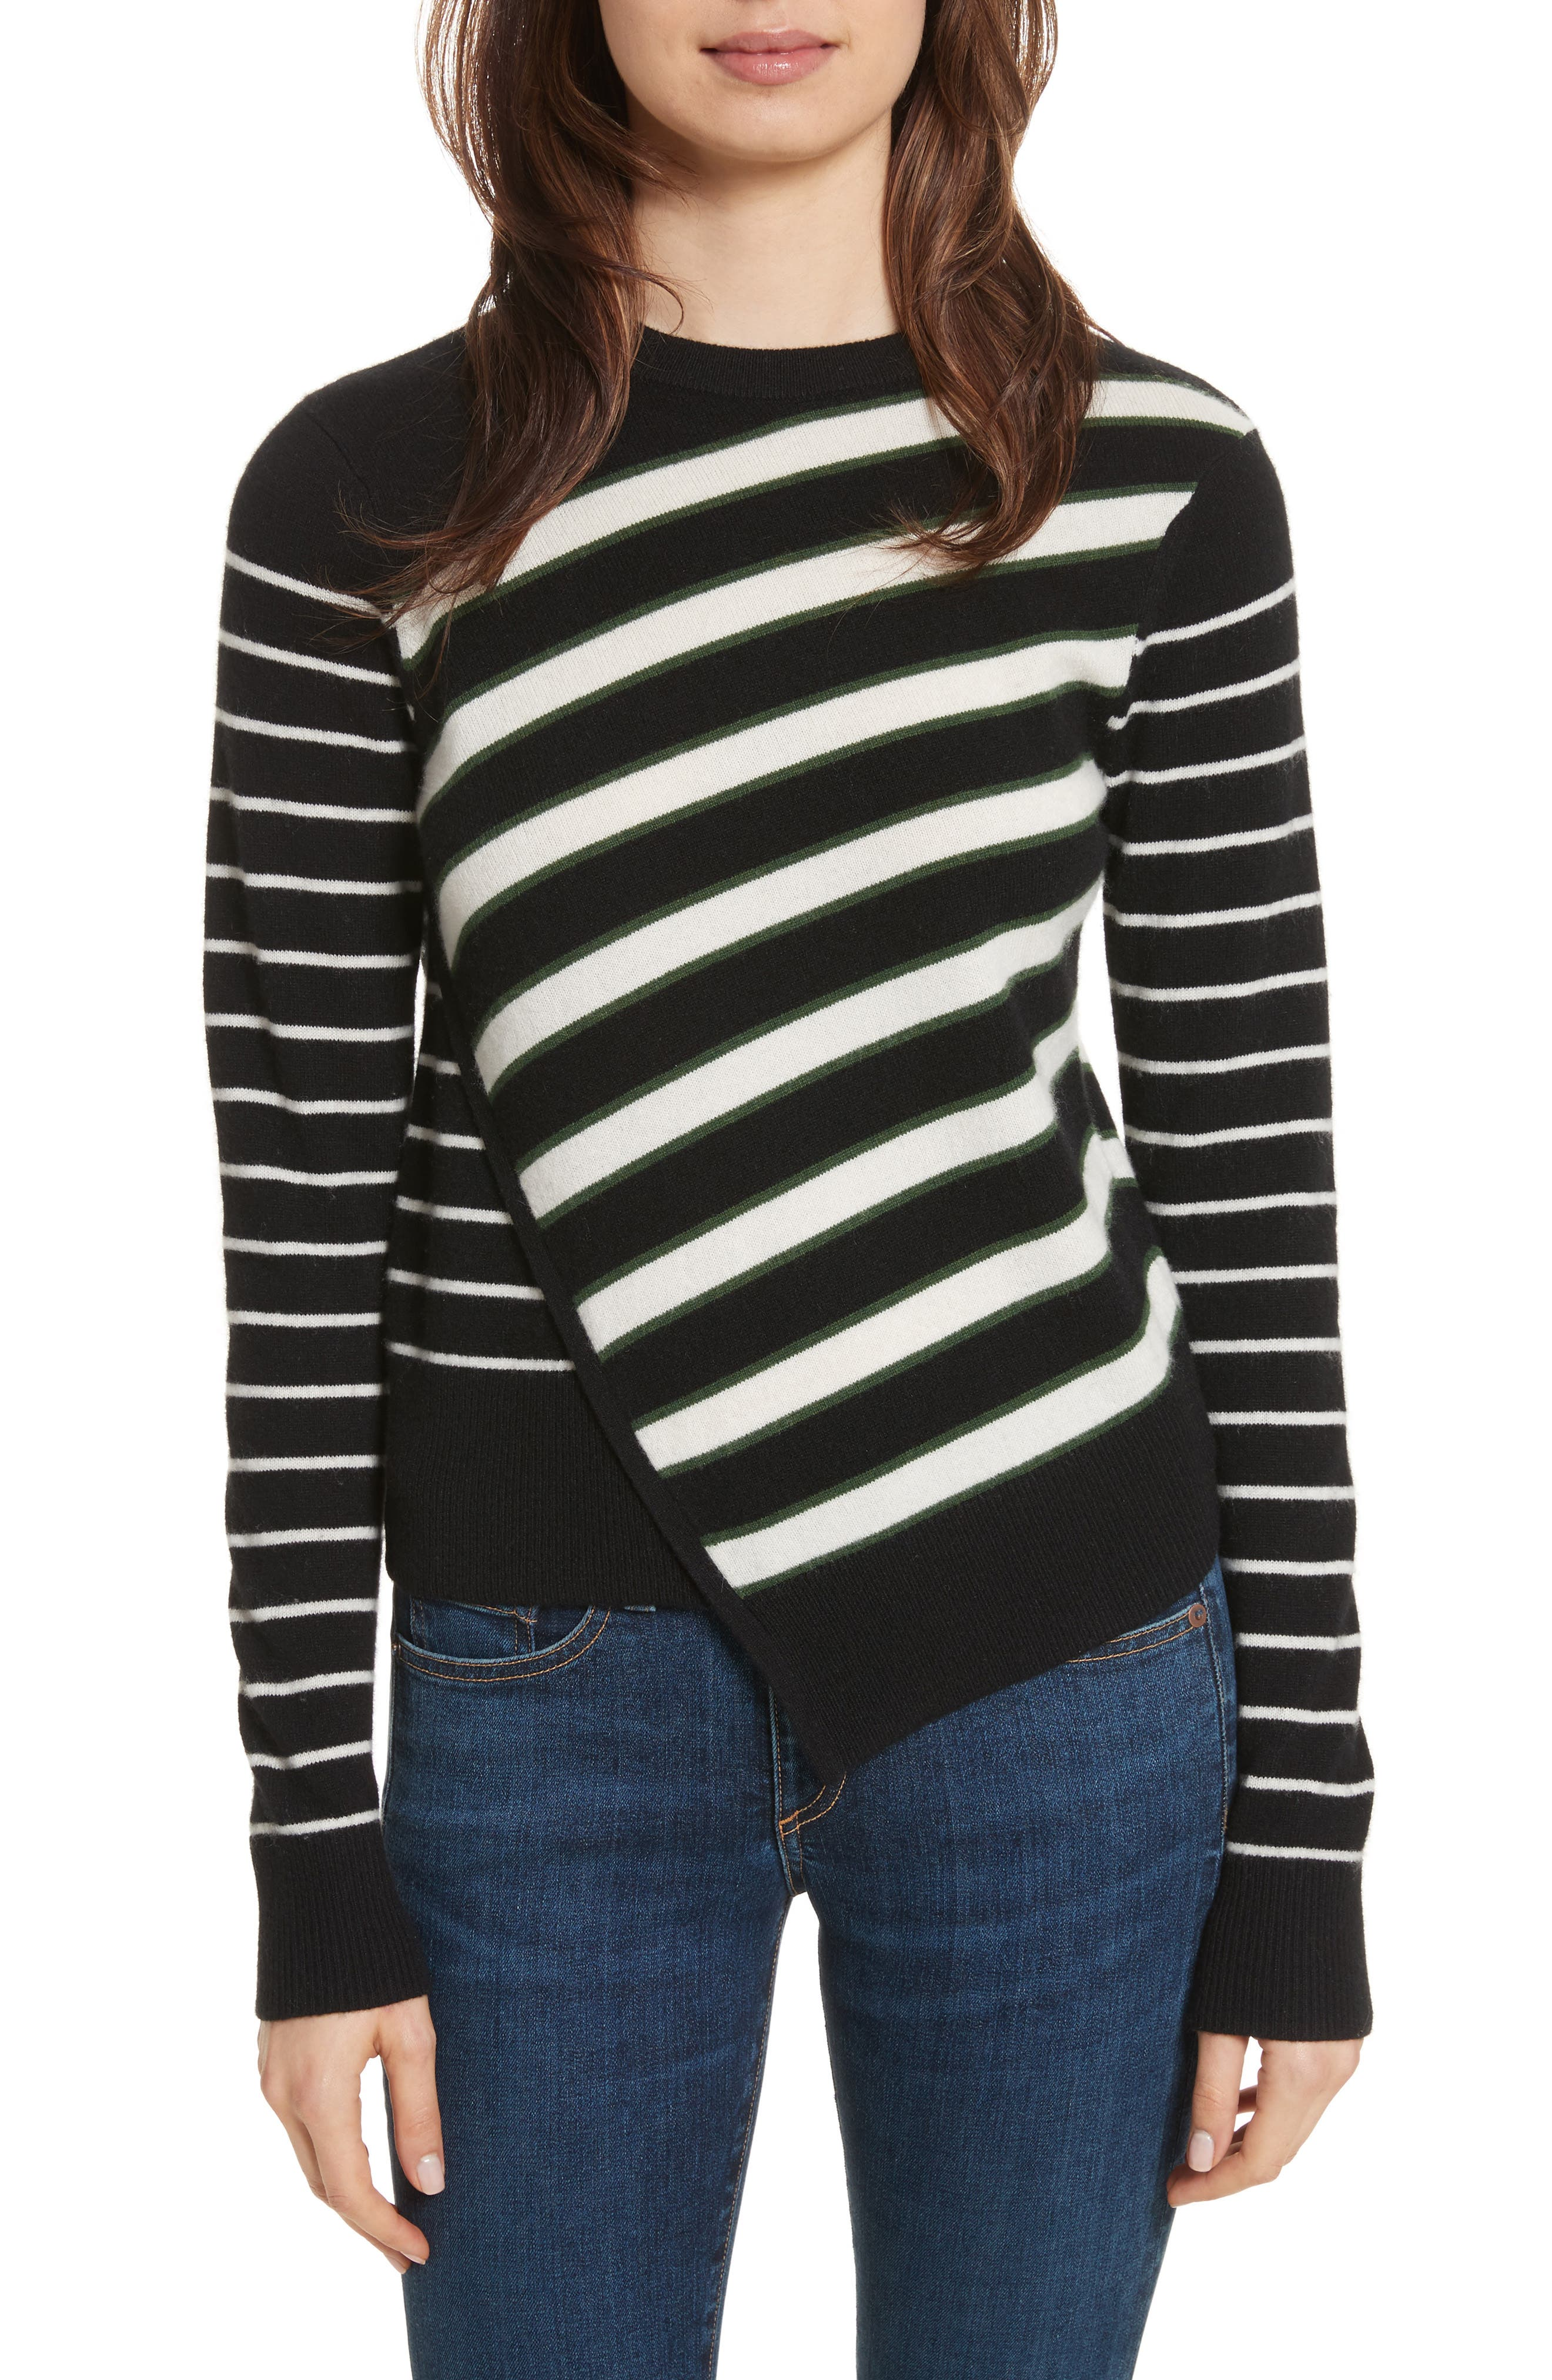 Pepper Cashmere Sweater,                         Main,                         color, 007